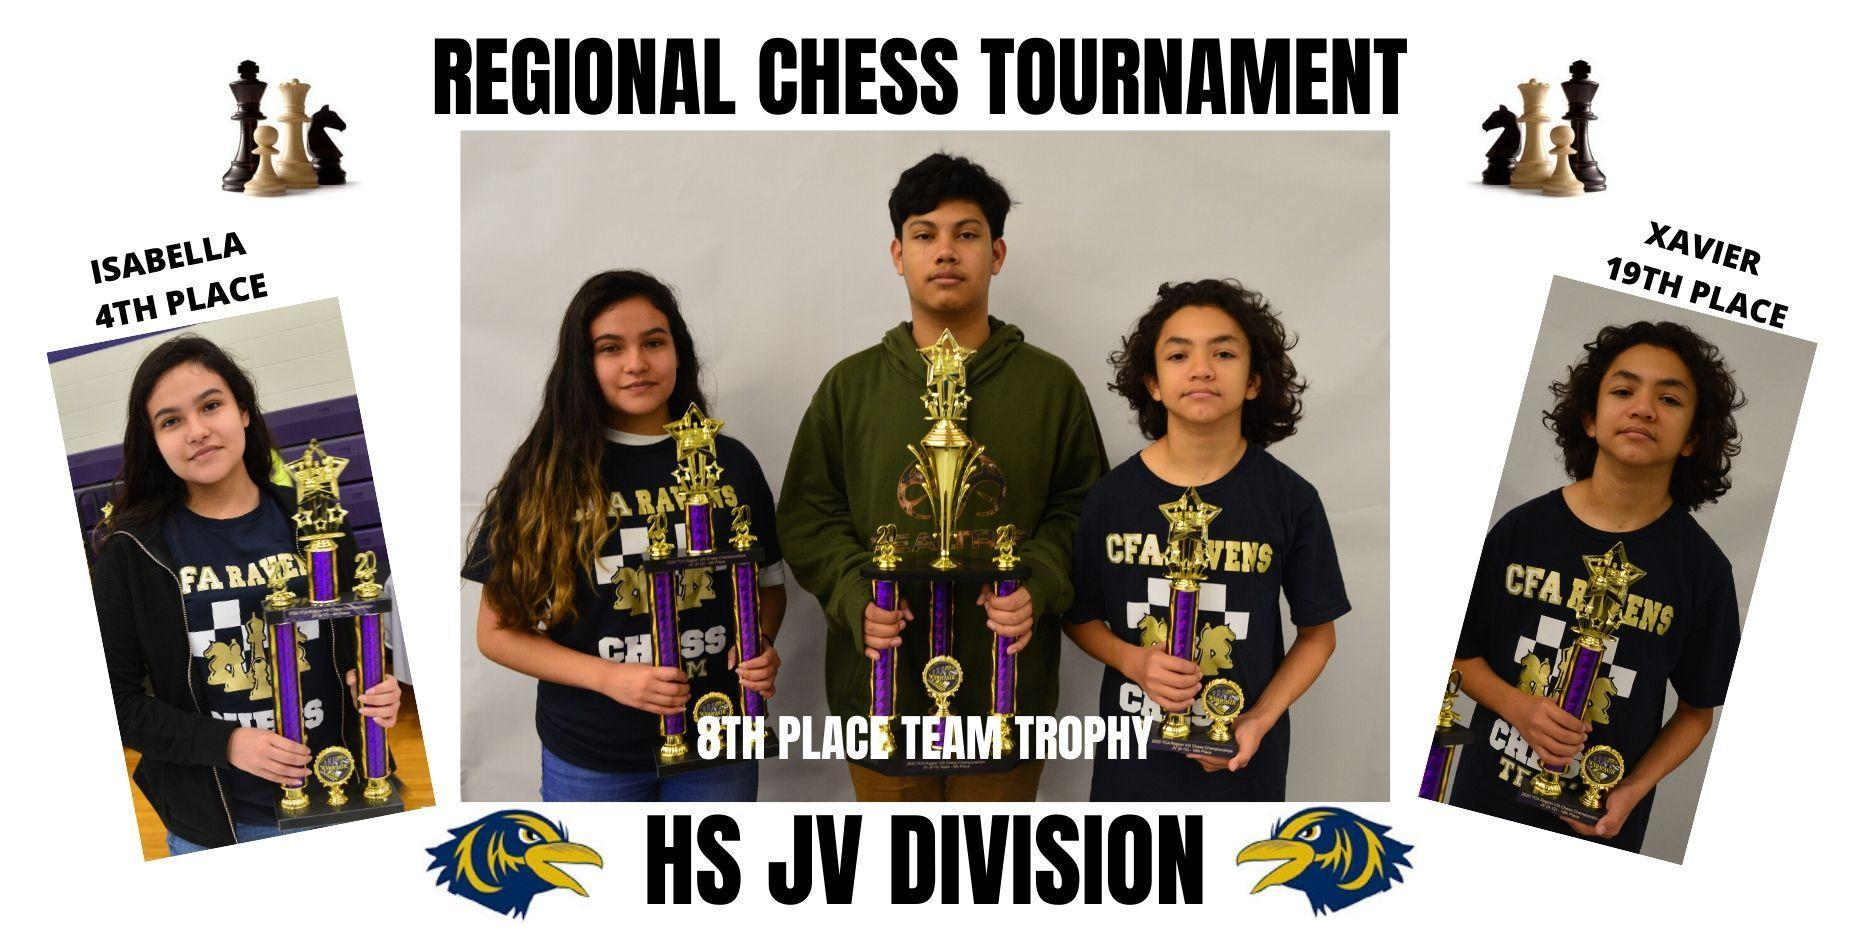 Regional Chess Tournament